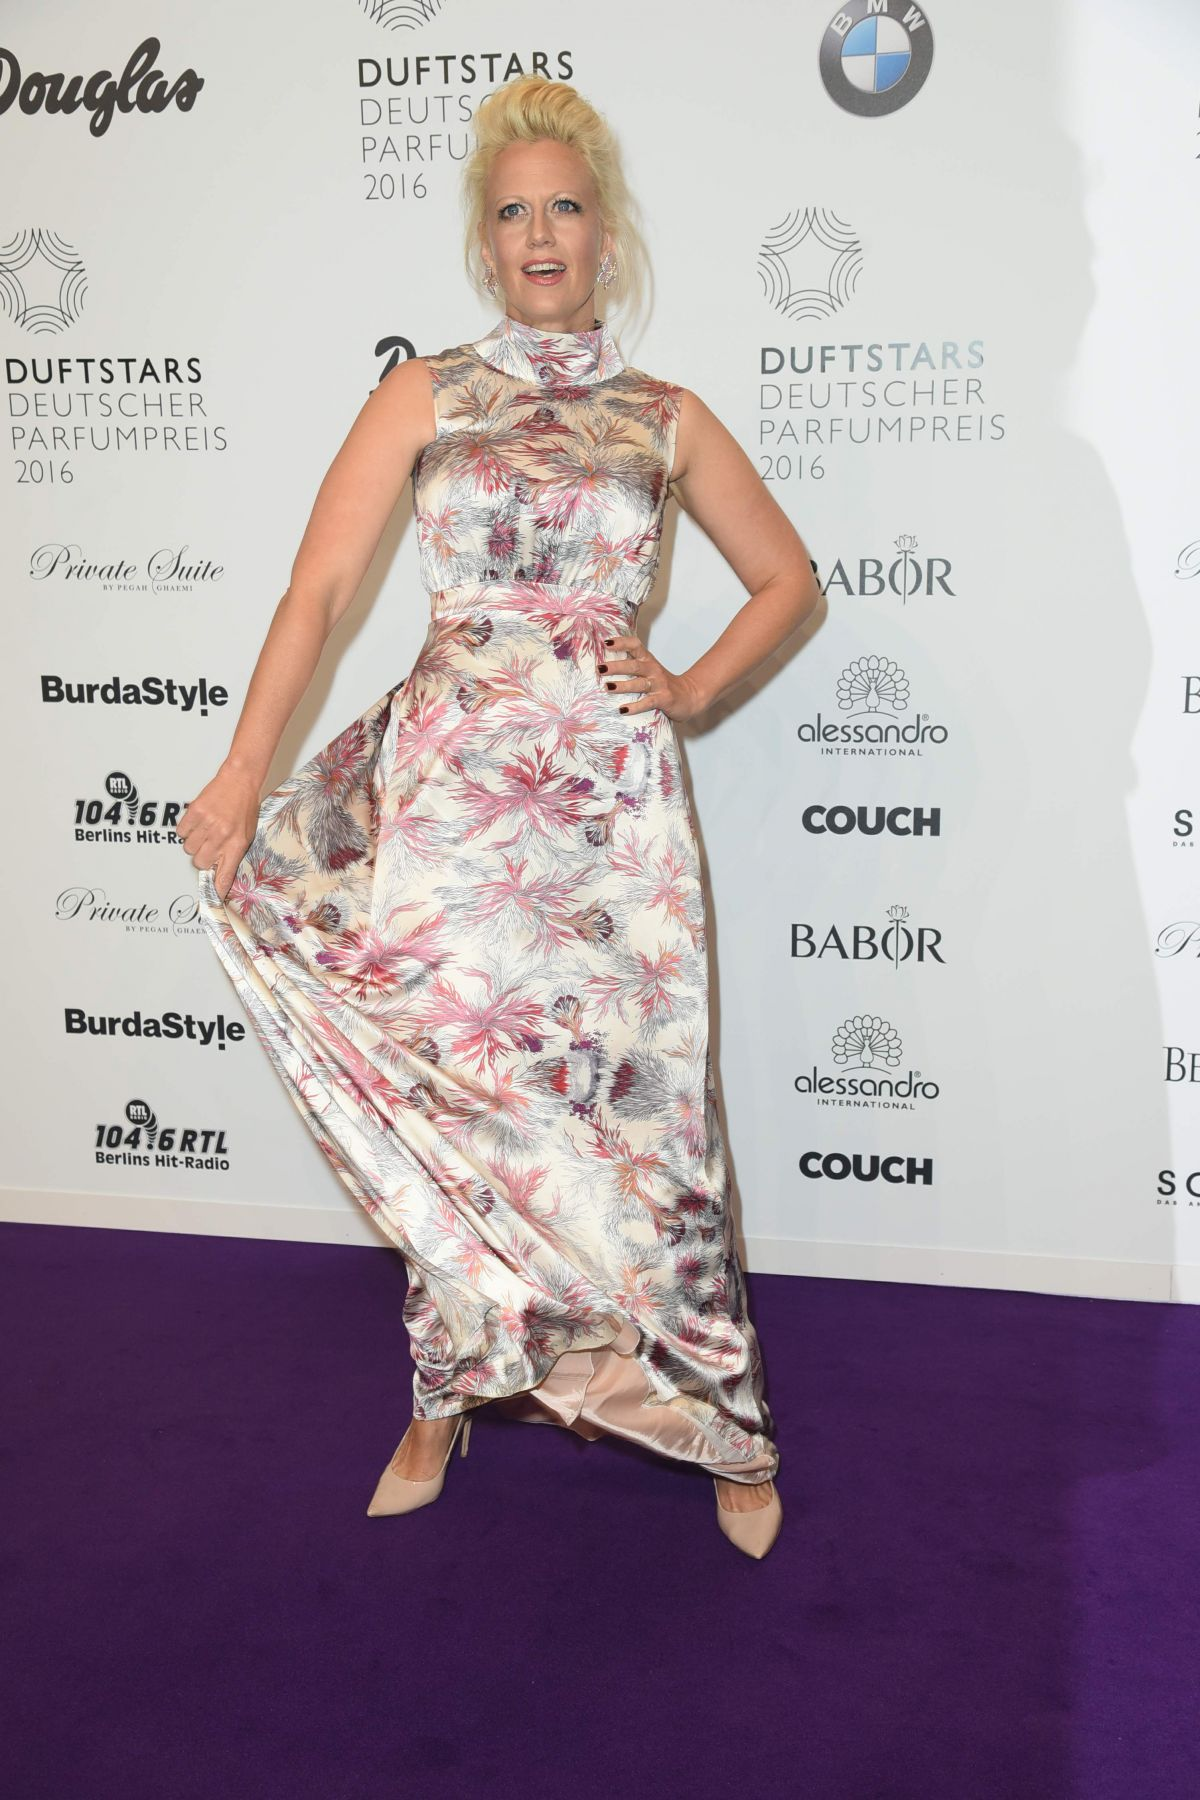 BARBARA SCHONEBERGER at German Perfume Prize in Berlin 05/12/2016